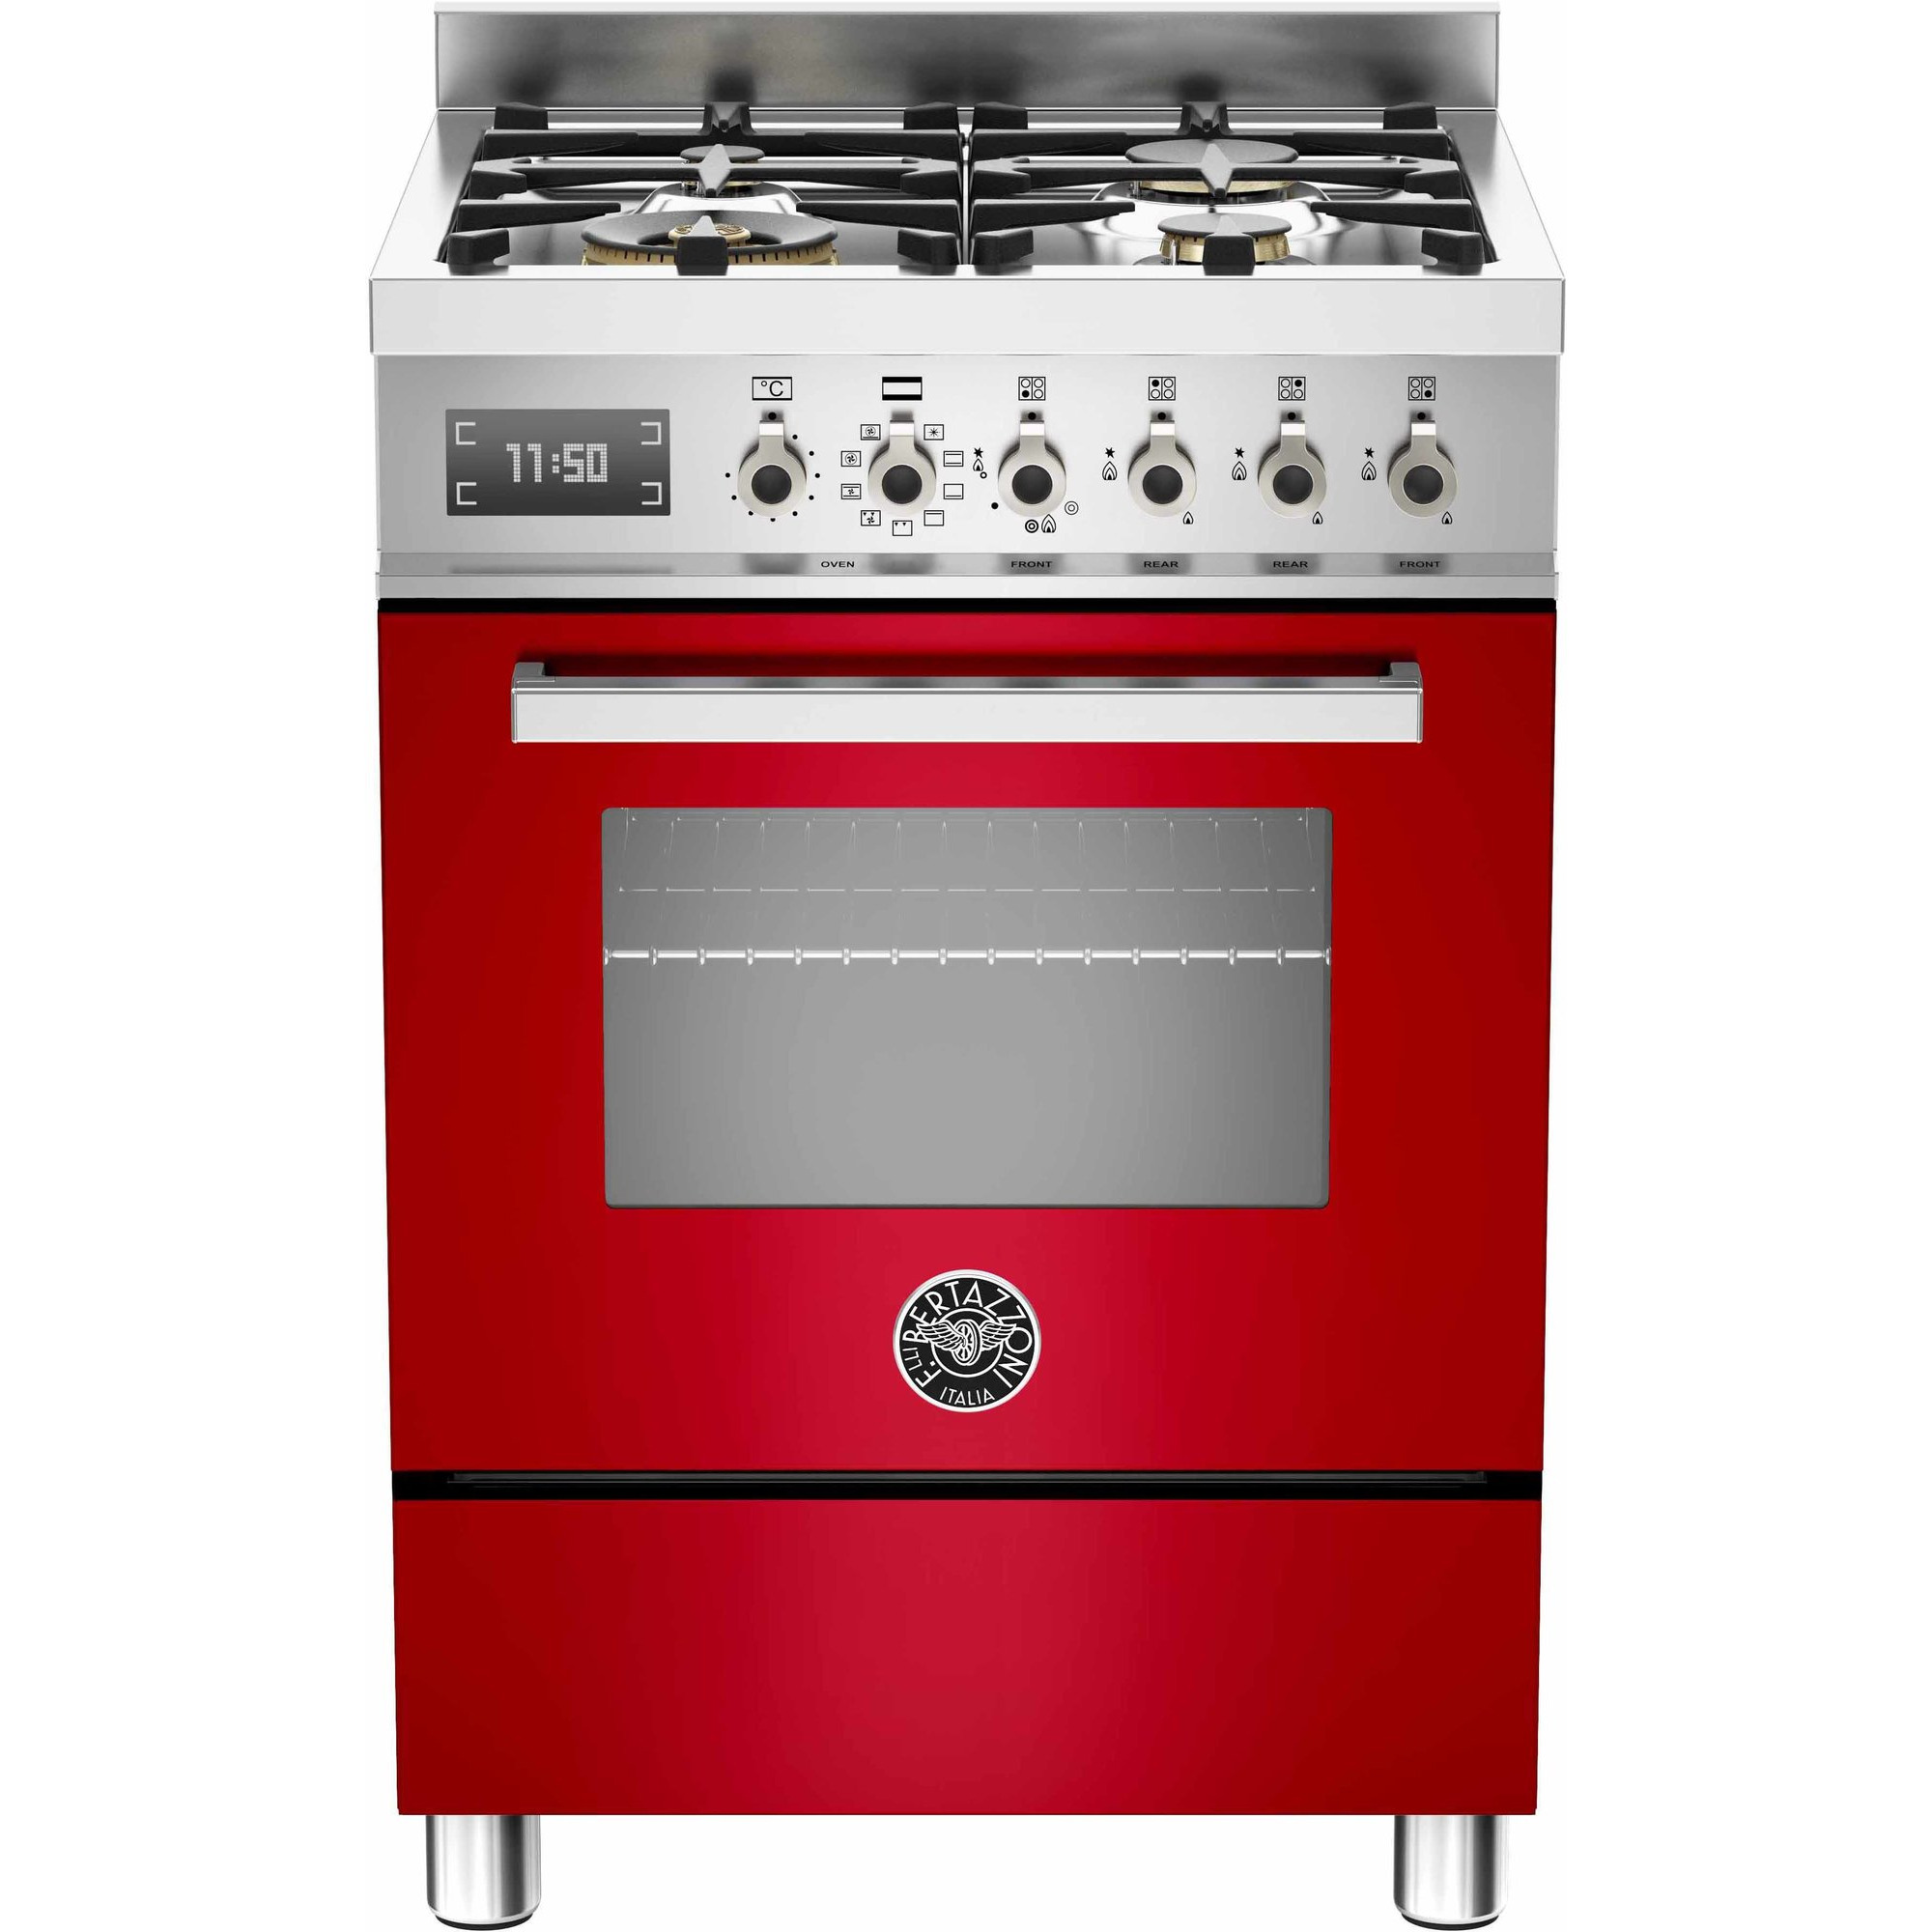 Bertazzoni PRO604 Gasspis 60 cm 1 ugn 4 brännare röd